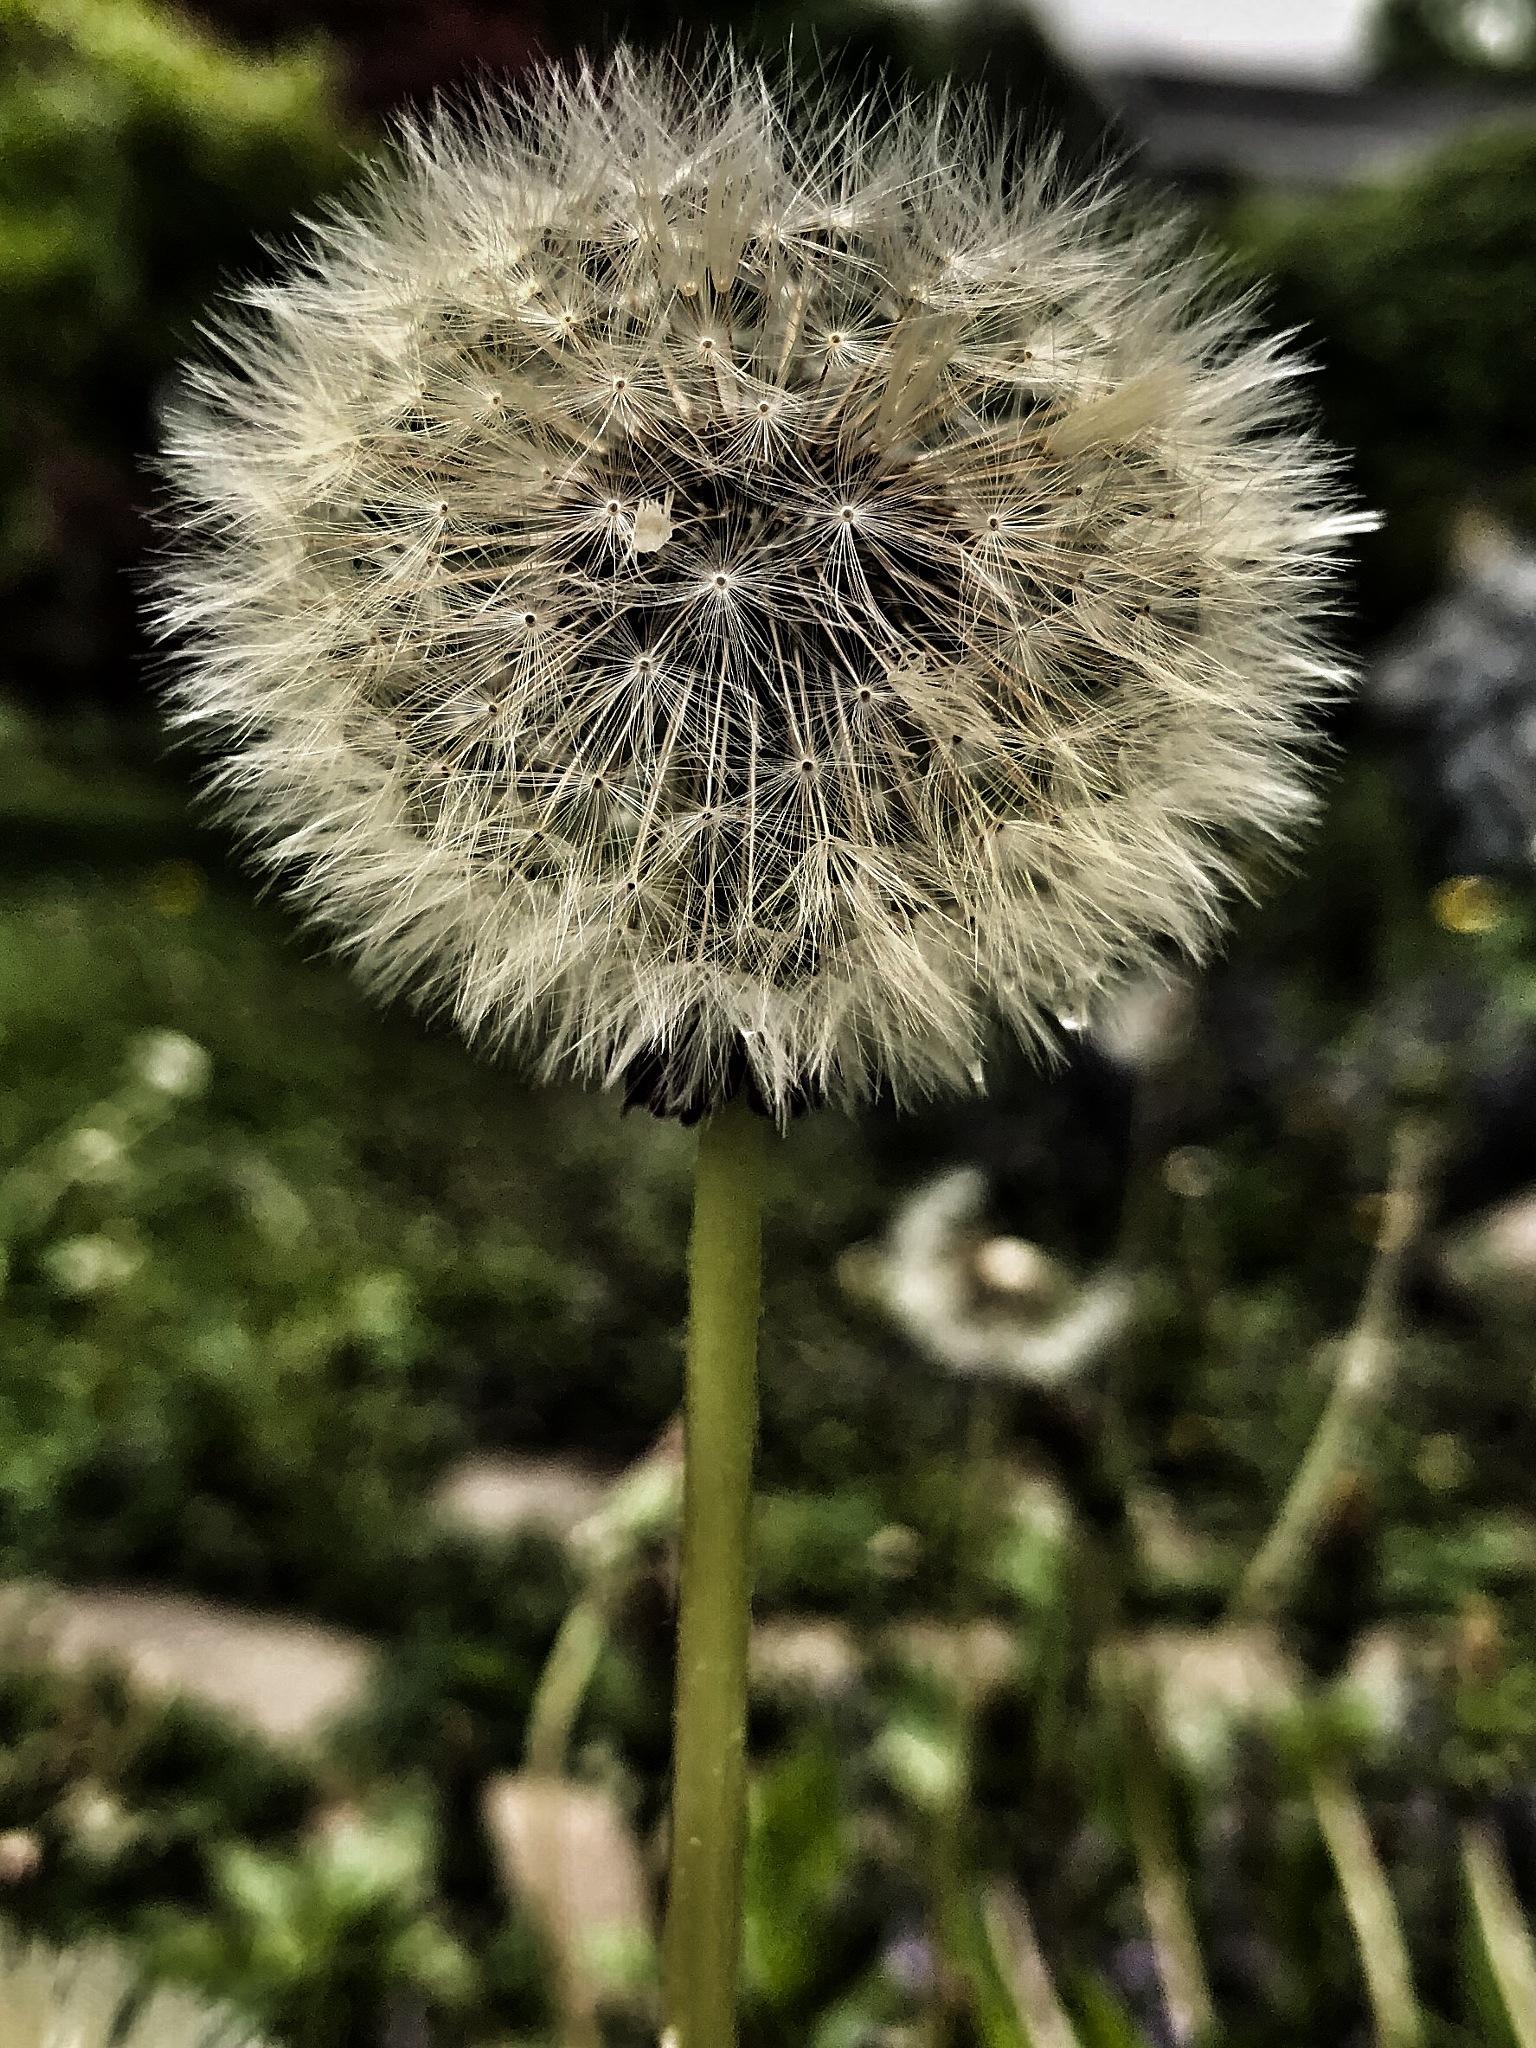 Dandelion  by Thomas Merring